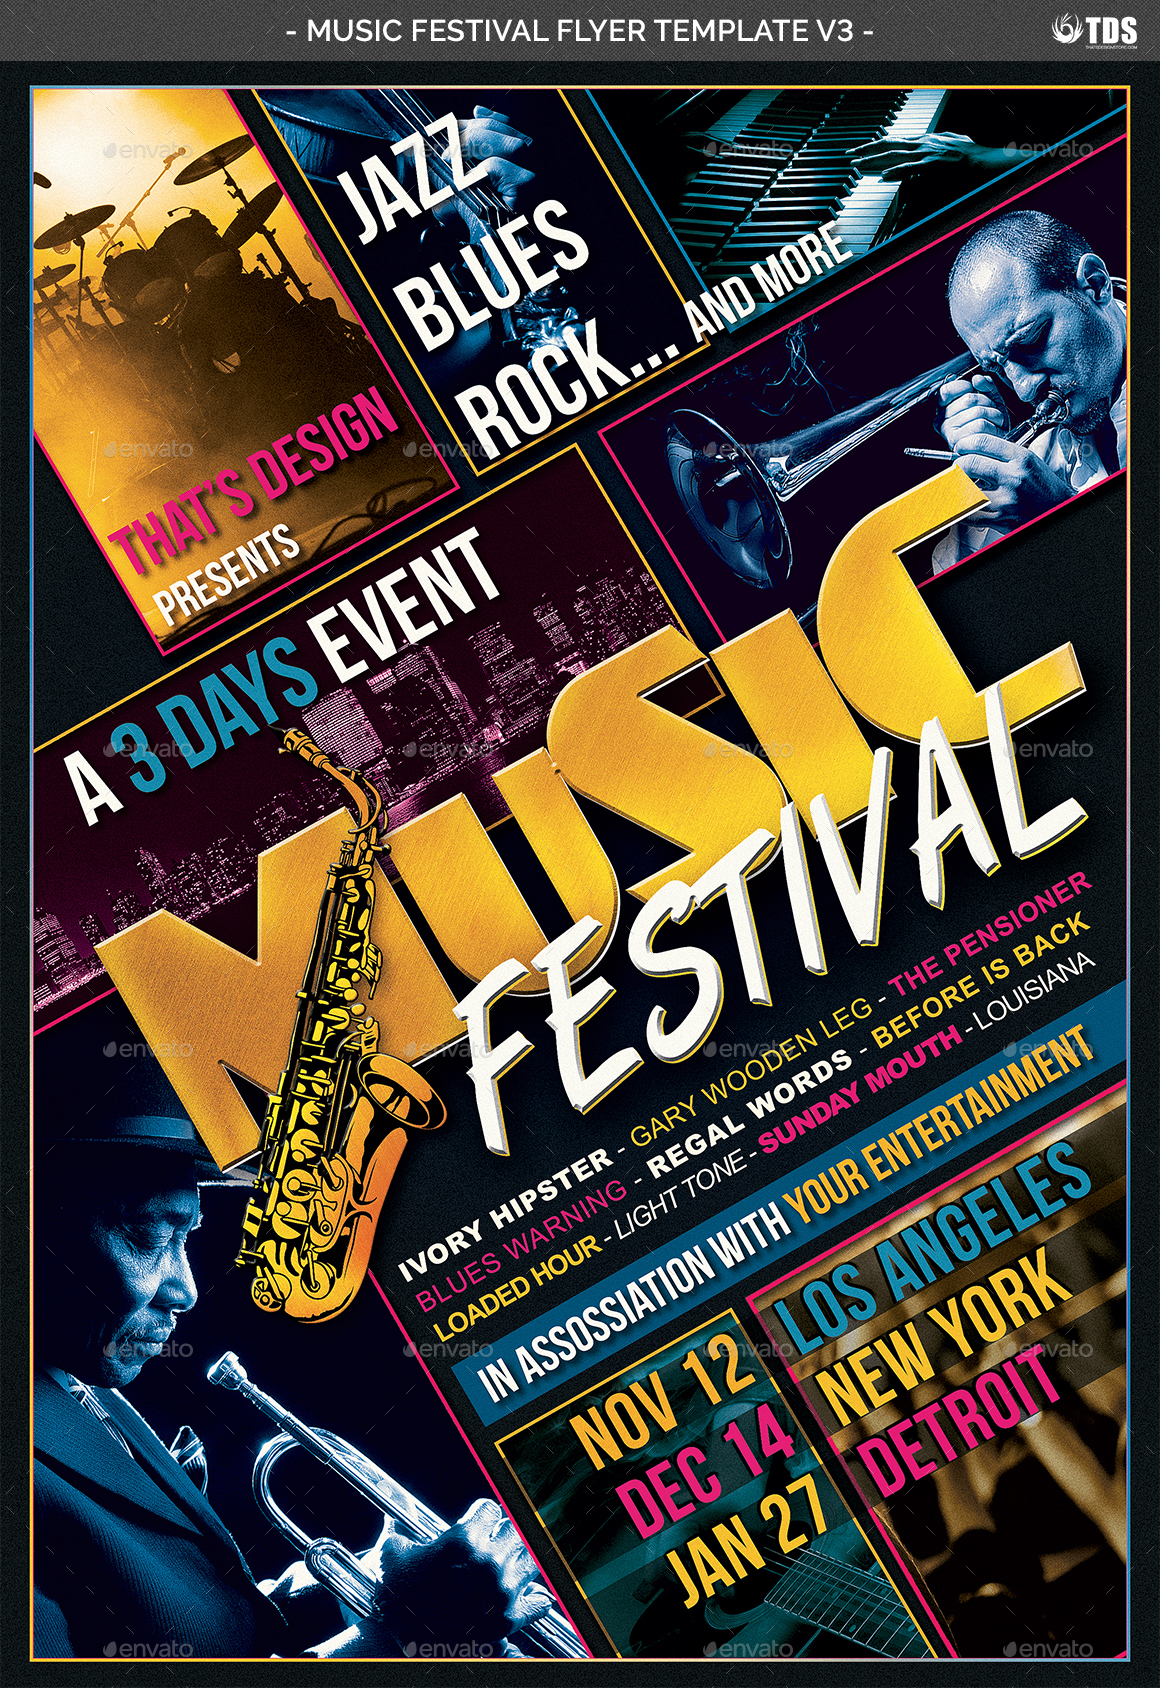 music festival flyer template v3 by lou606